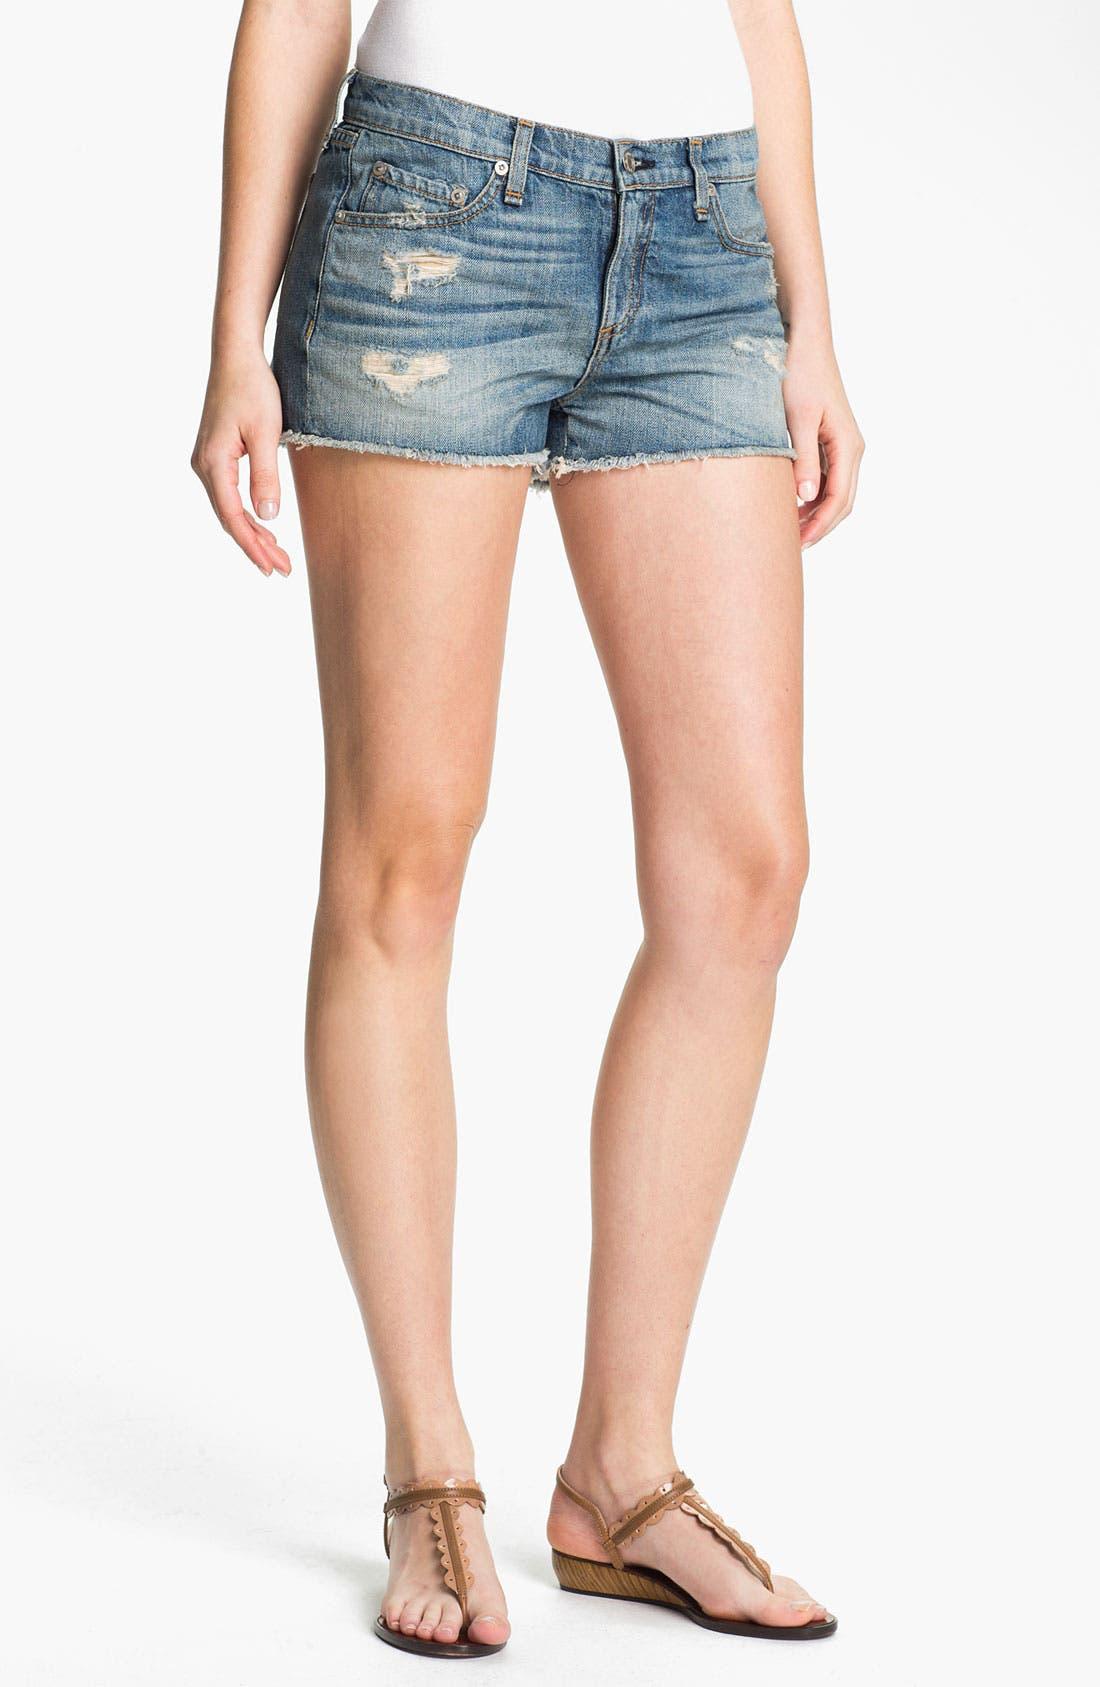 Alternate Image 1 Selected - rag & bone/JEAN 'The Cutoff' Denim Shorts